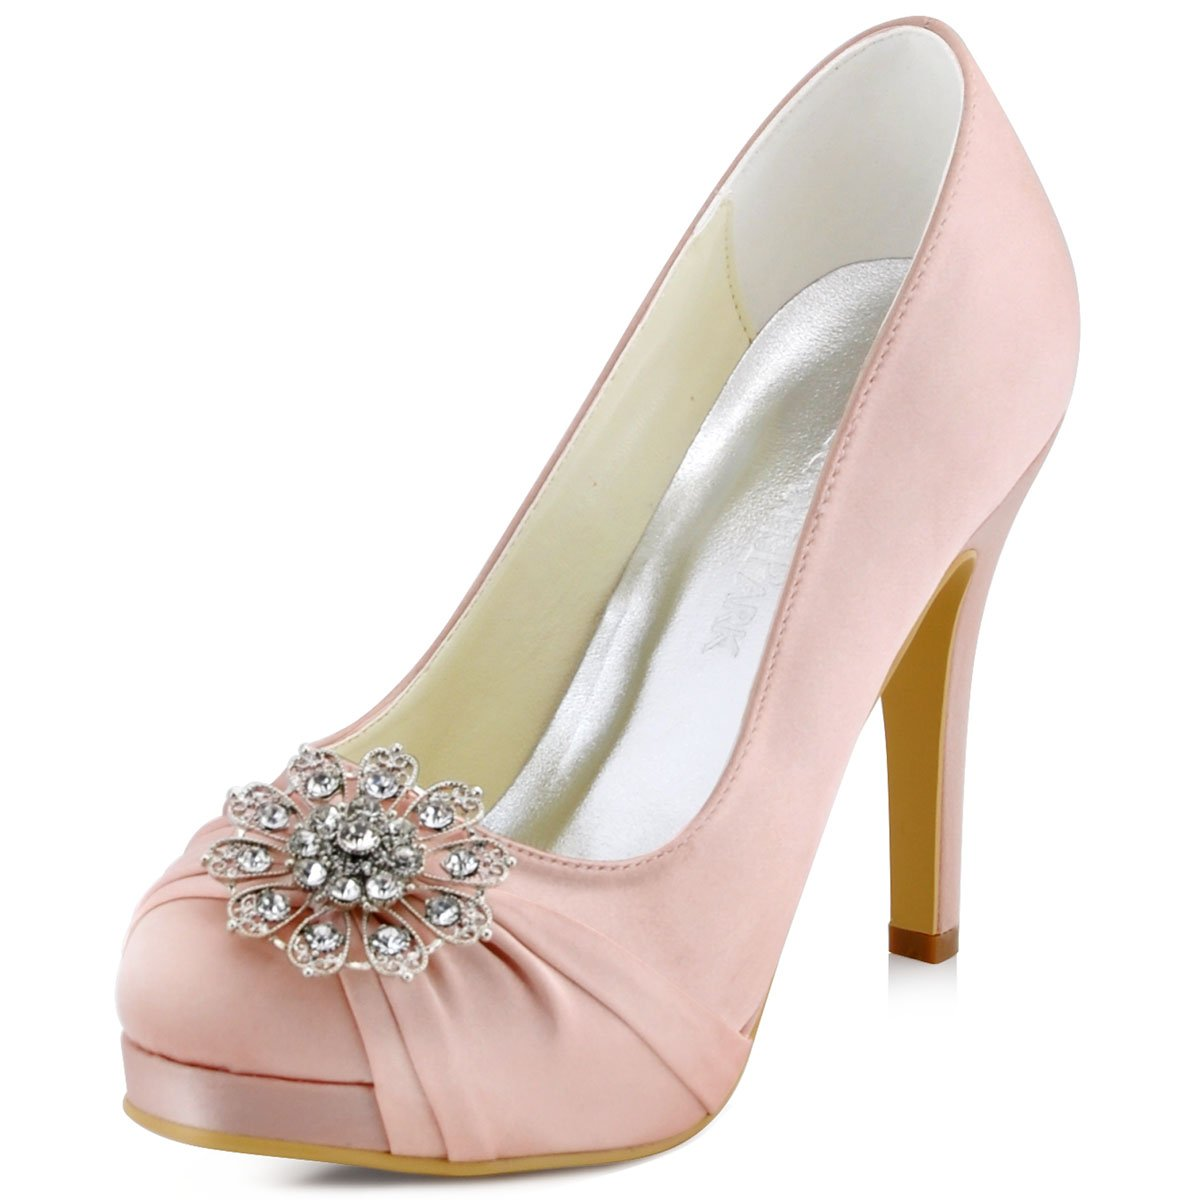 Elegantpark EP2015 Women's Evening Pumps Buckle High Heel Platform Satin Wedding Bridal Shoes